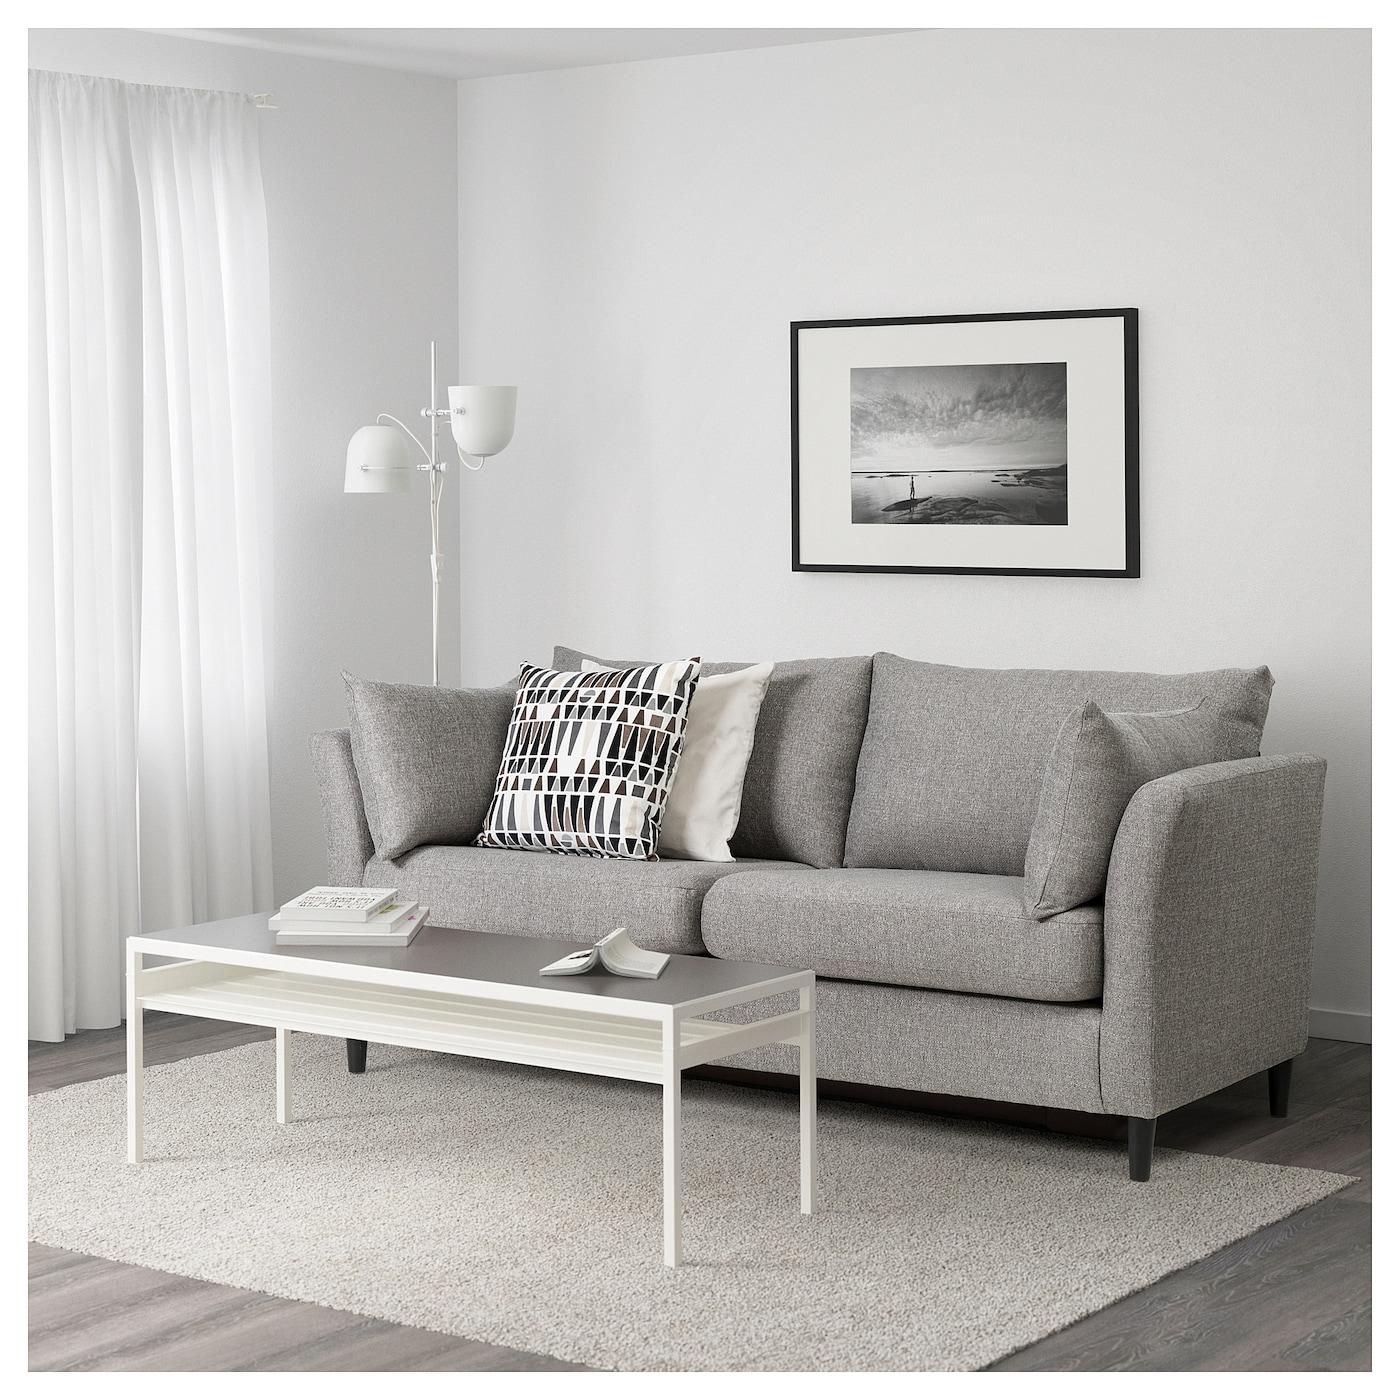 BANKERYD 3-seat sofa Grey - IKEA